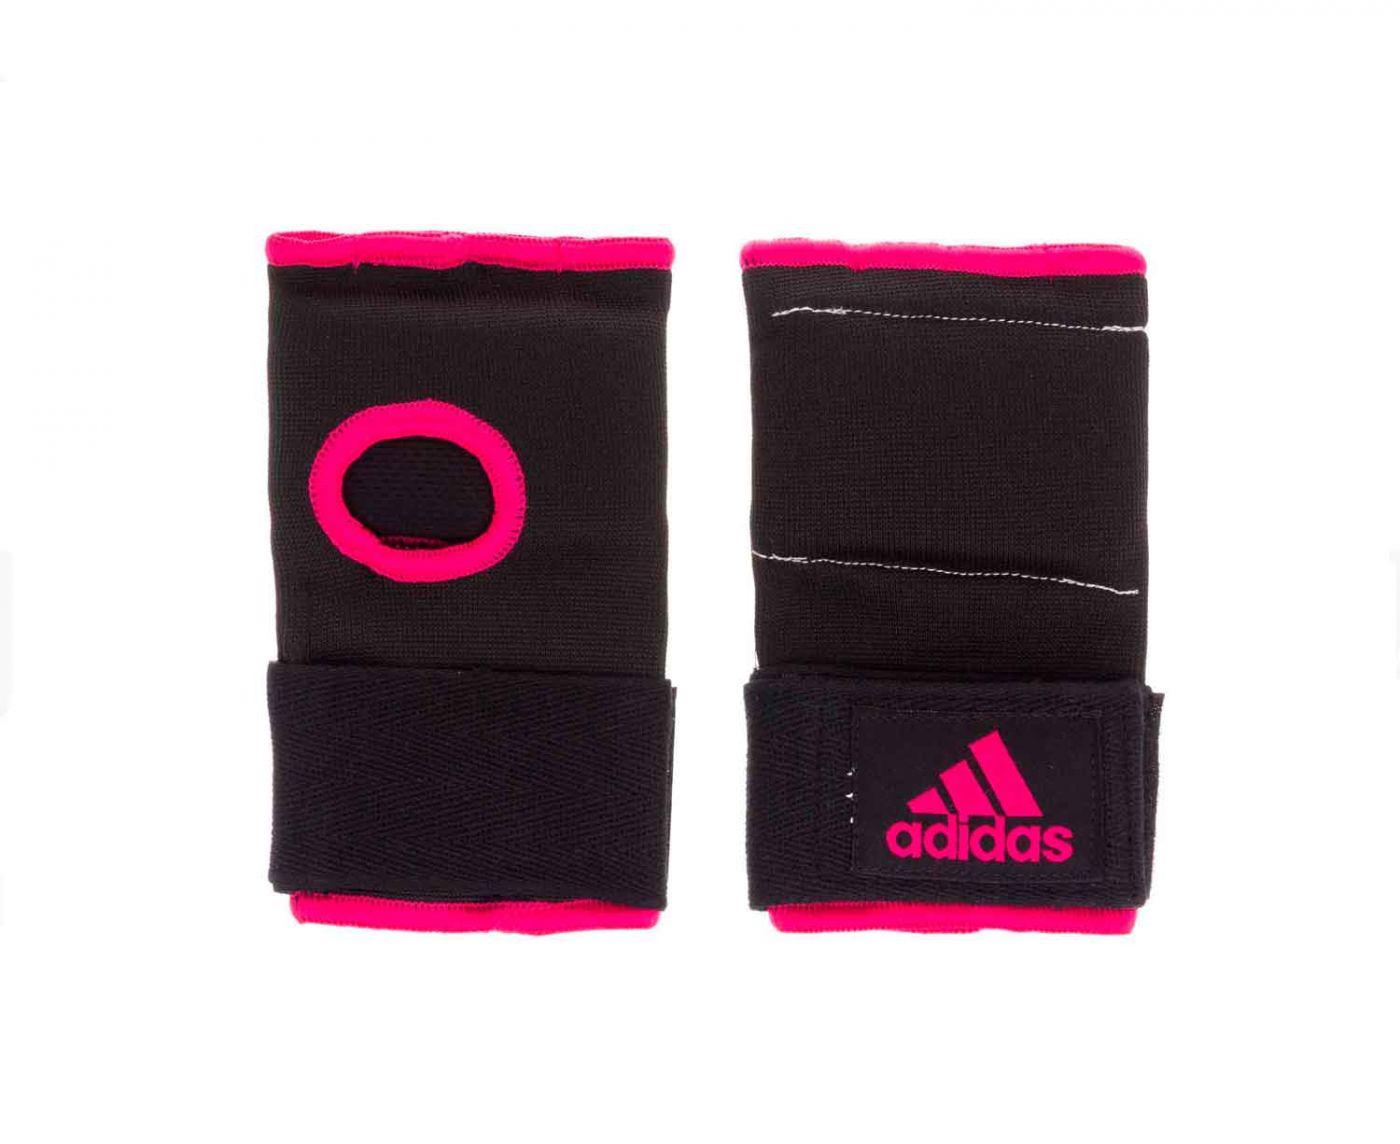 Внутренние перчатки Adidas Super Inner Gloves Gel Knuckle черно-розовые р. M. артикул adiBP021